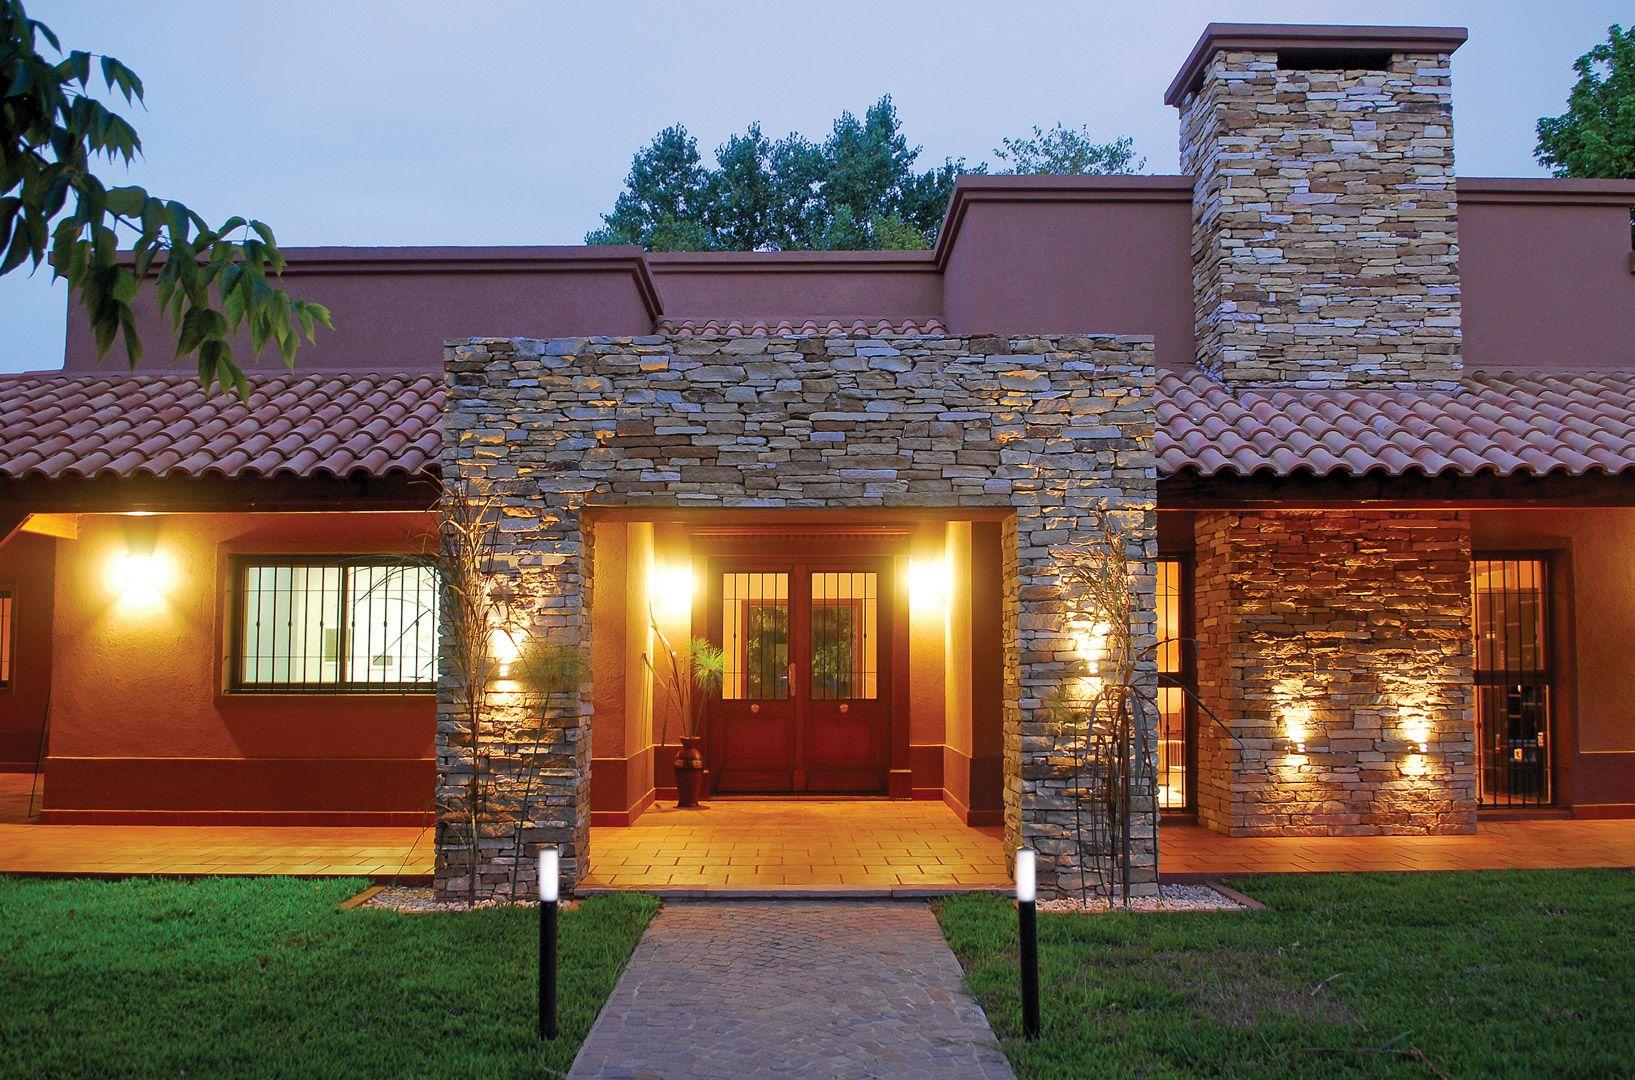 Galeria fotos perretta ocampo arquitectura casa for Casas estilo clasico moderno